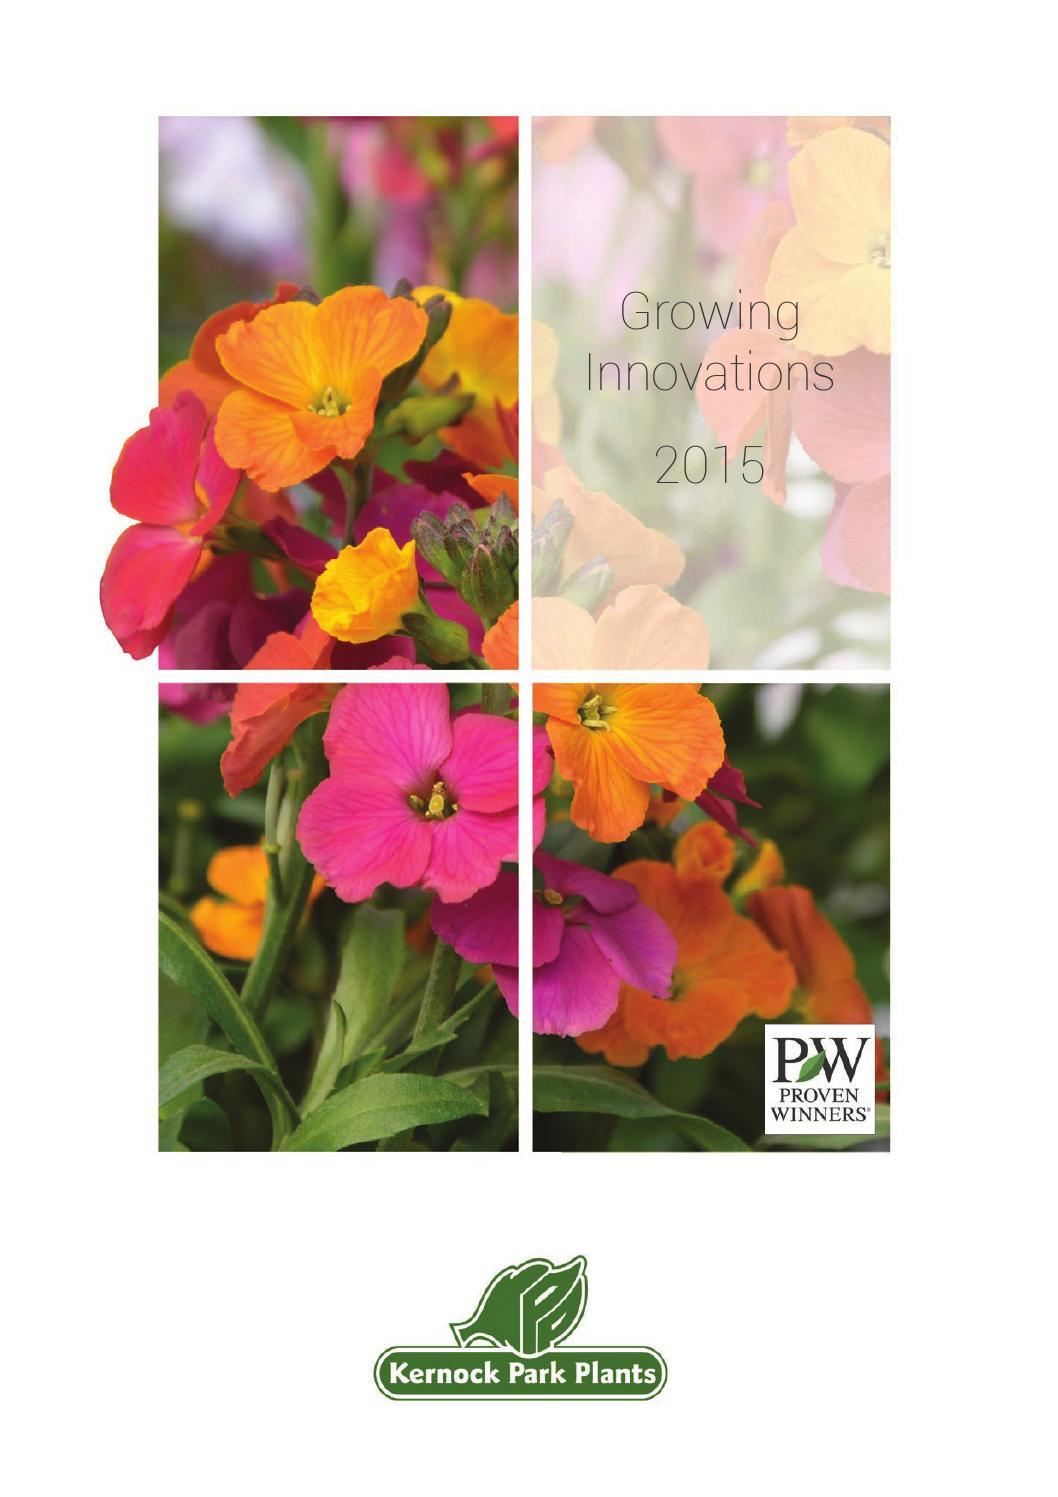 Incl. Pot Myrtus Rainbows Gold Scented Upright Evergreen Flowering Variegated Garden Shrub 20-30cm